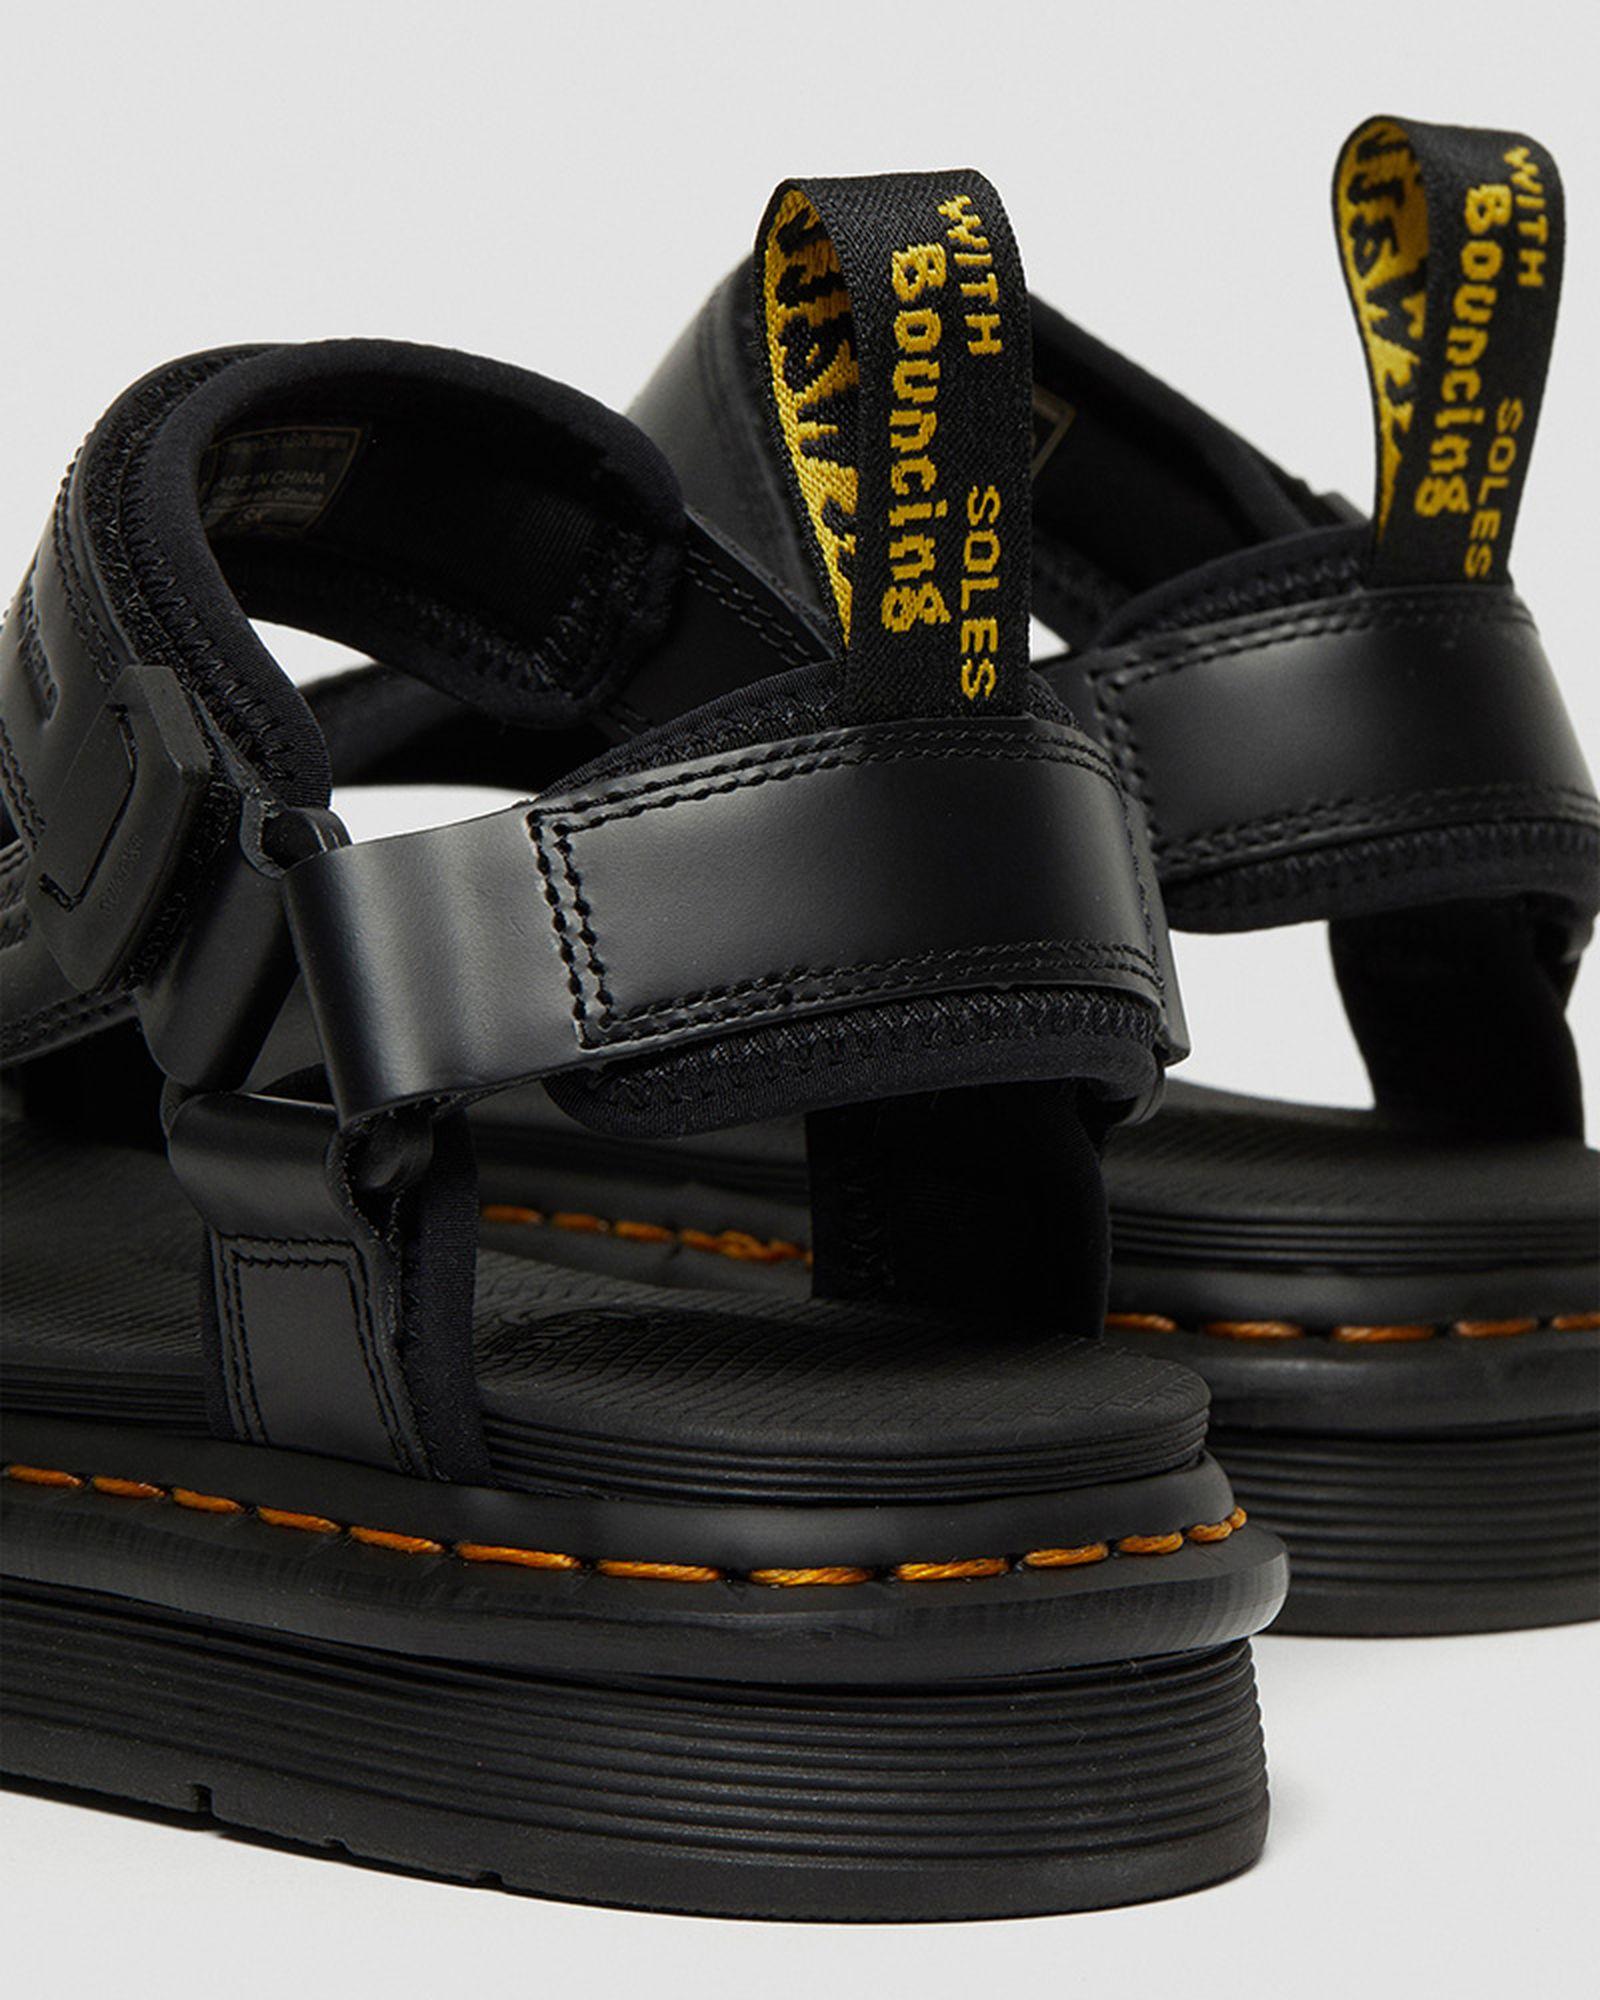 dr-martens-suicoke-sandals-release-date-price-07